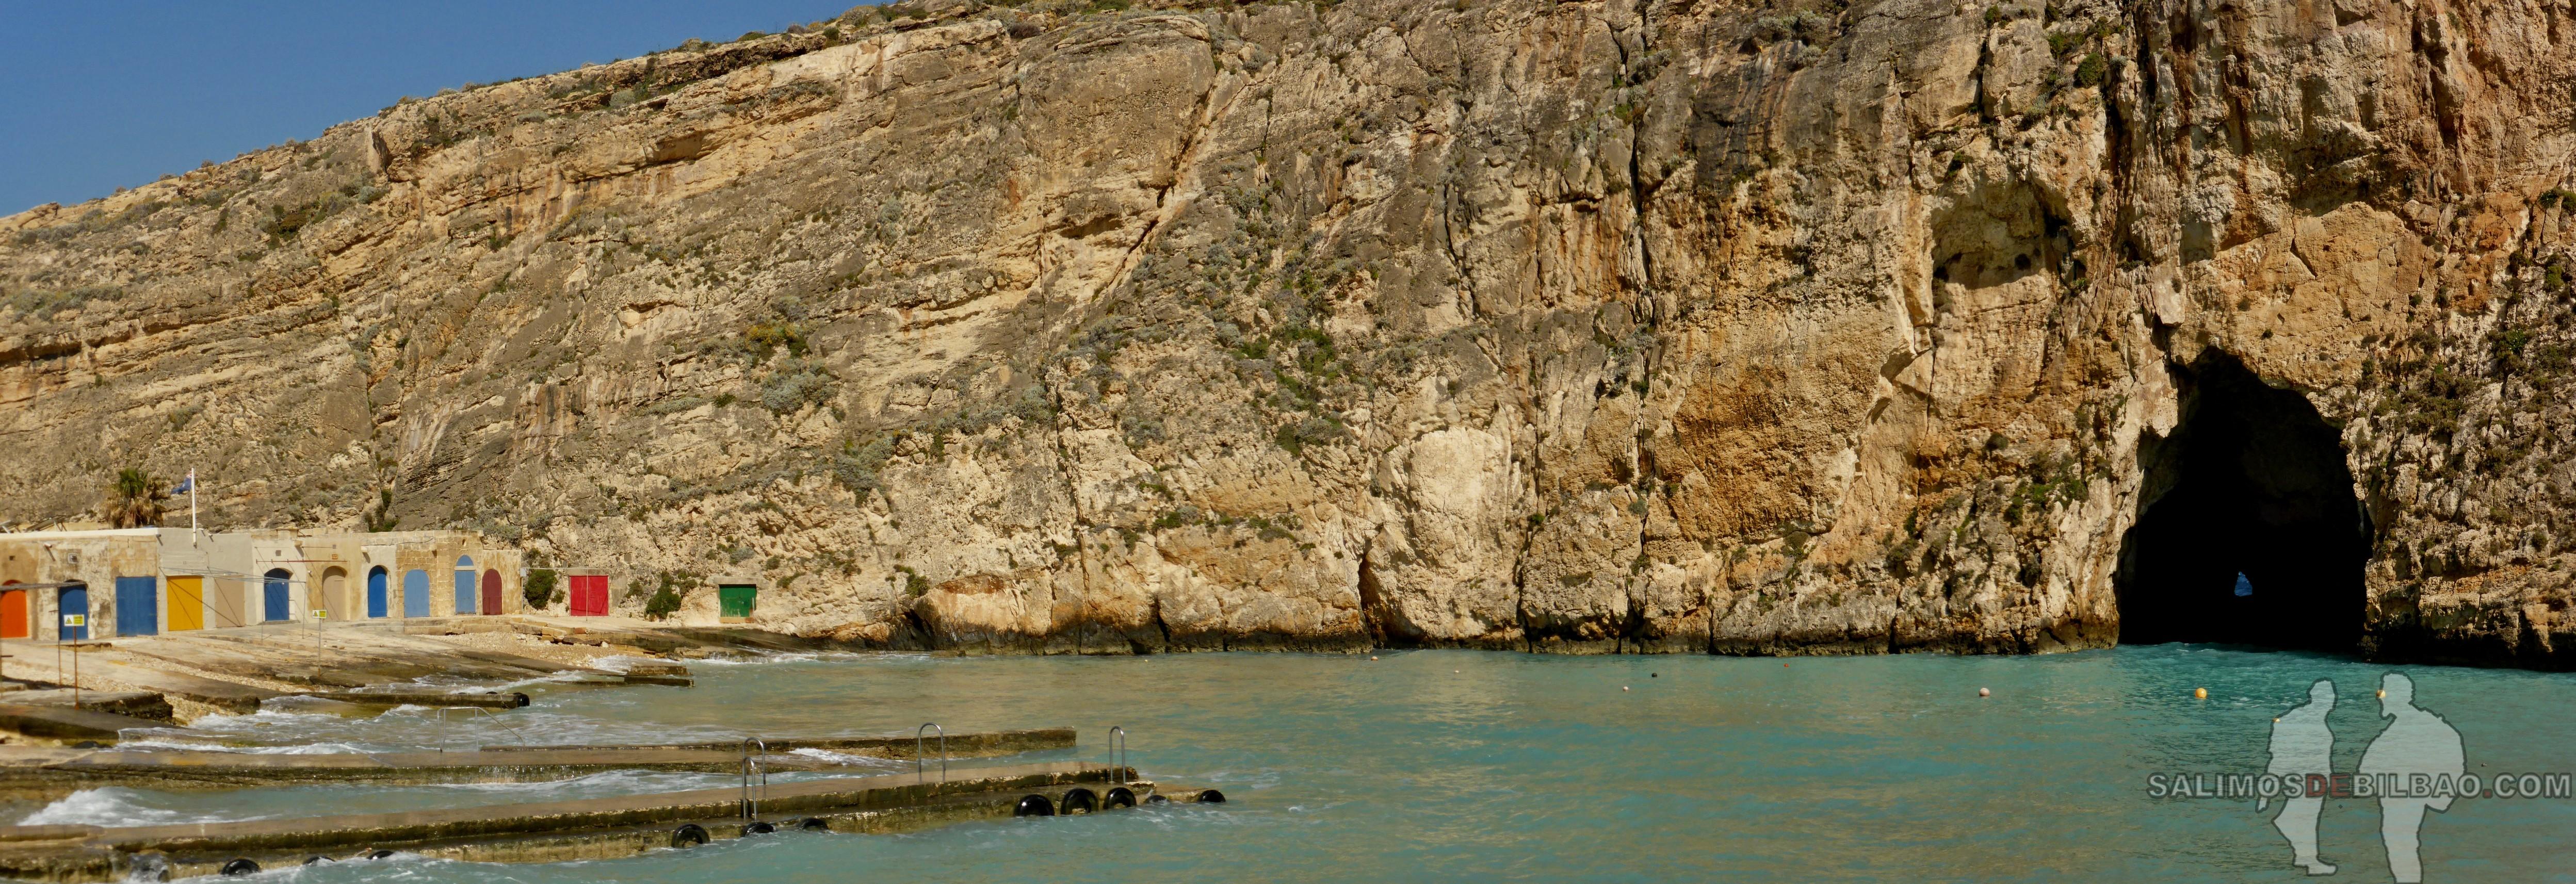 0530. Pano, Inland Sea, Gozo